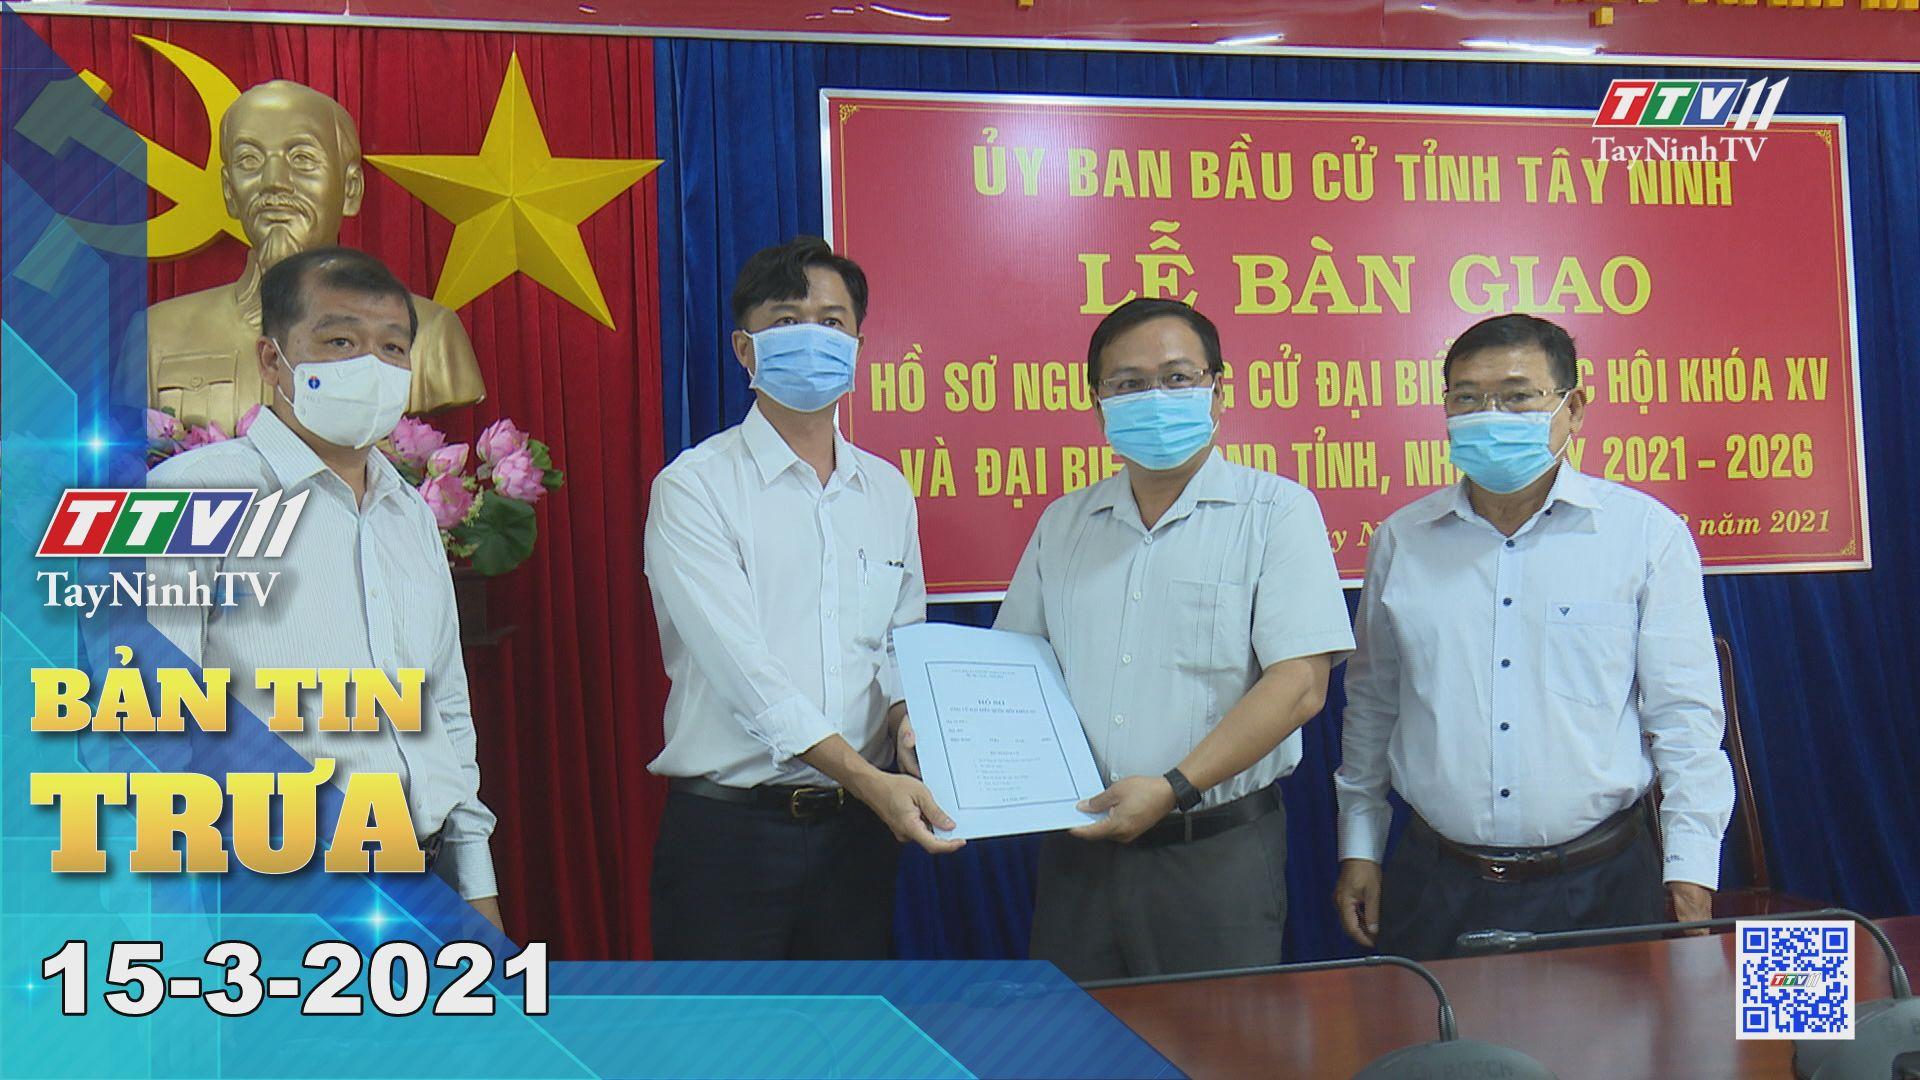 Bản tin trưa 15-3-2021 | Tin tức hôm nay | TayNinhTV